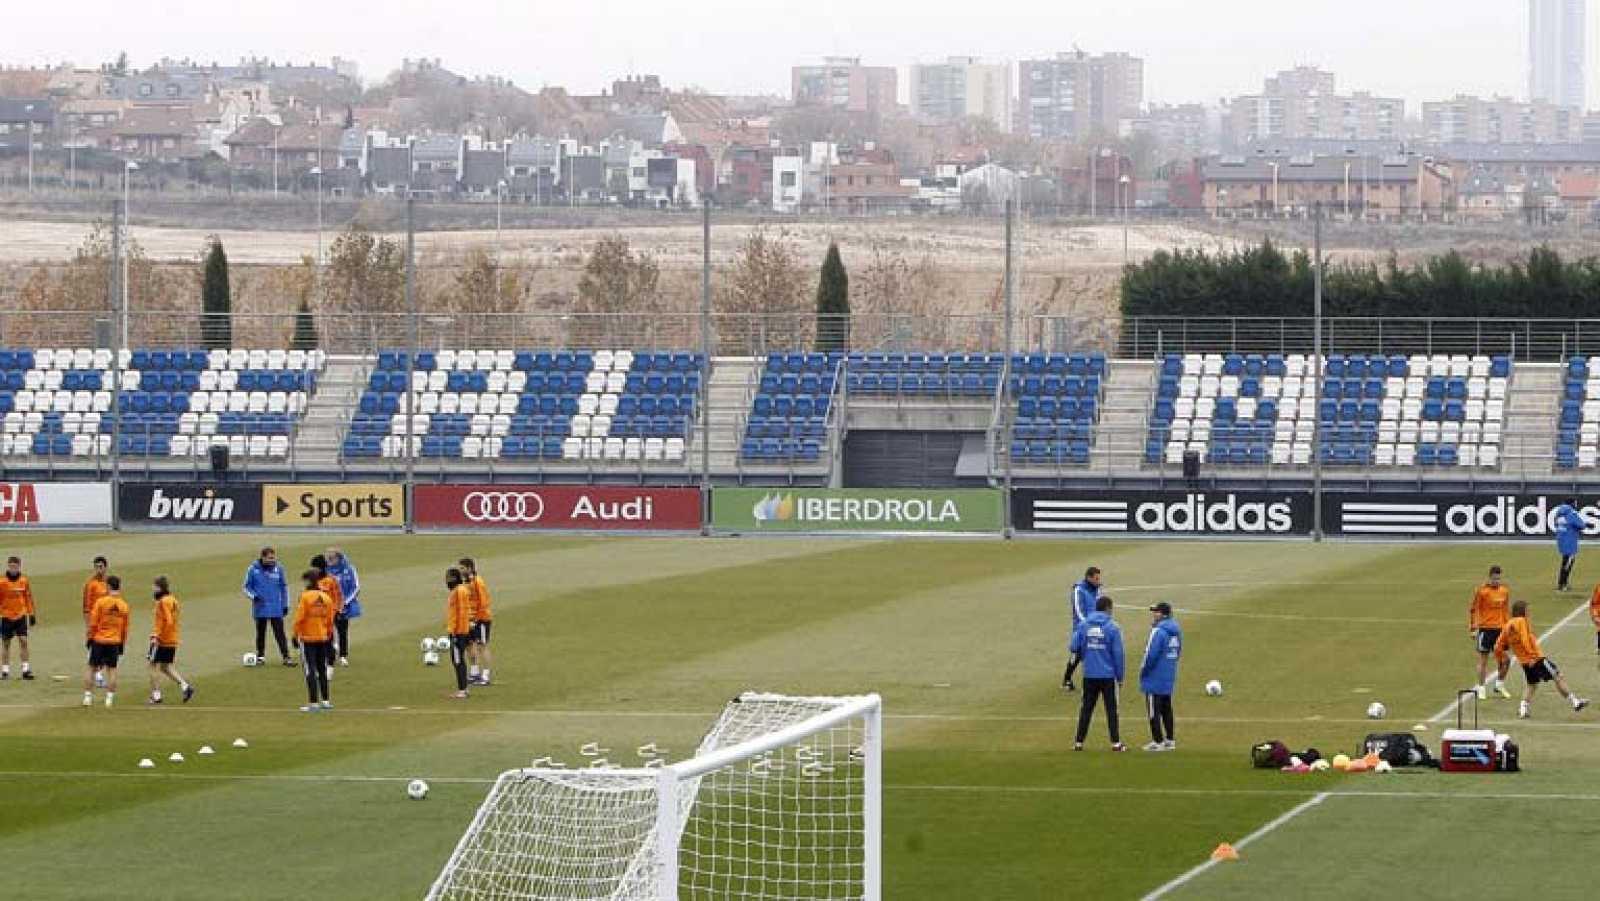 La Comisión Europea confirma que investiga  a siete clubes españoles de fútbol